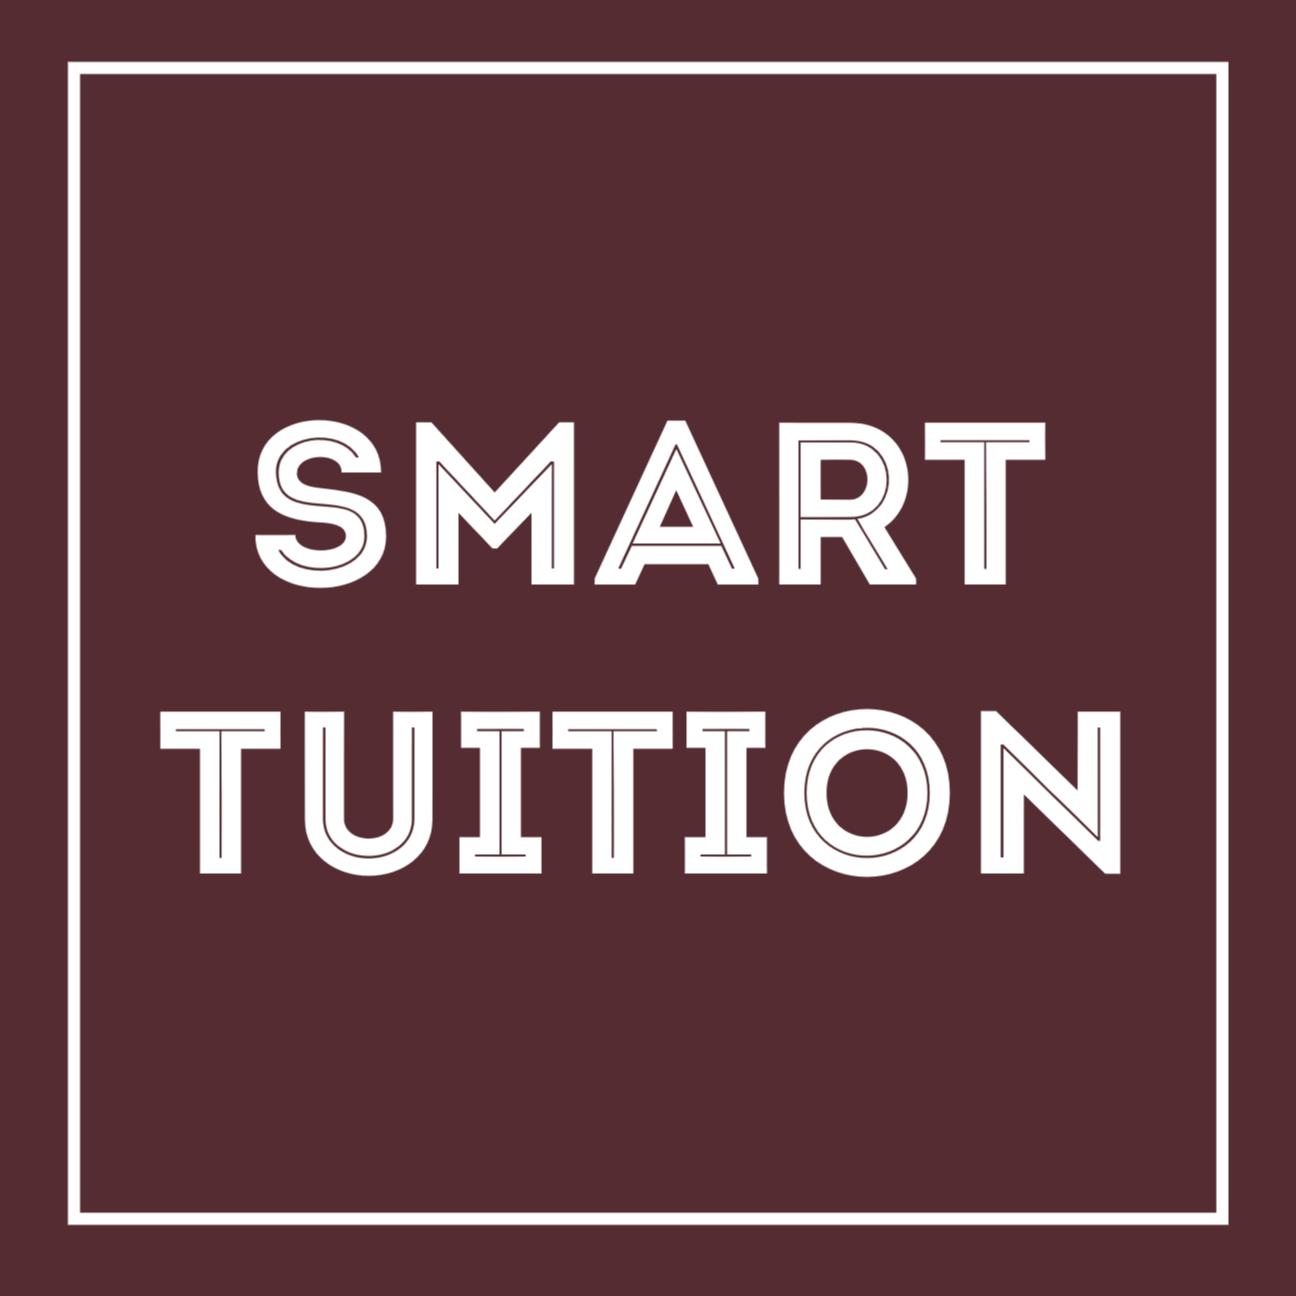 Smart Tuition.jpg